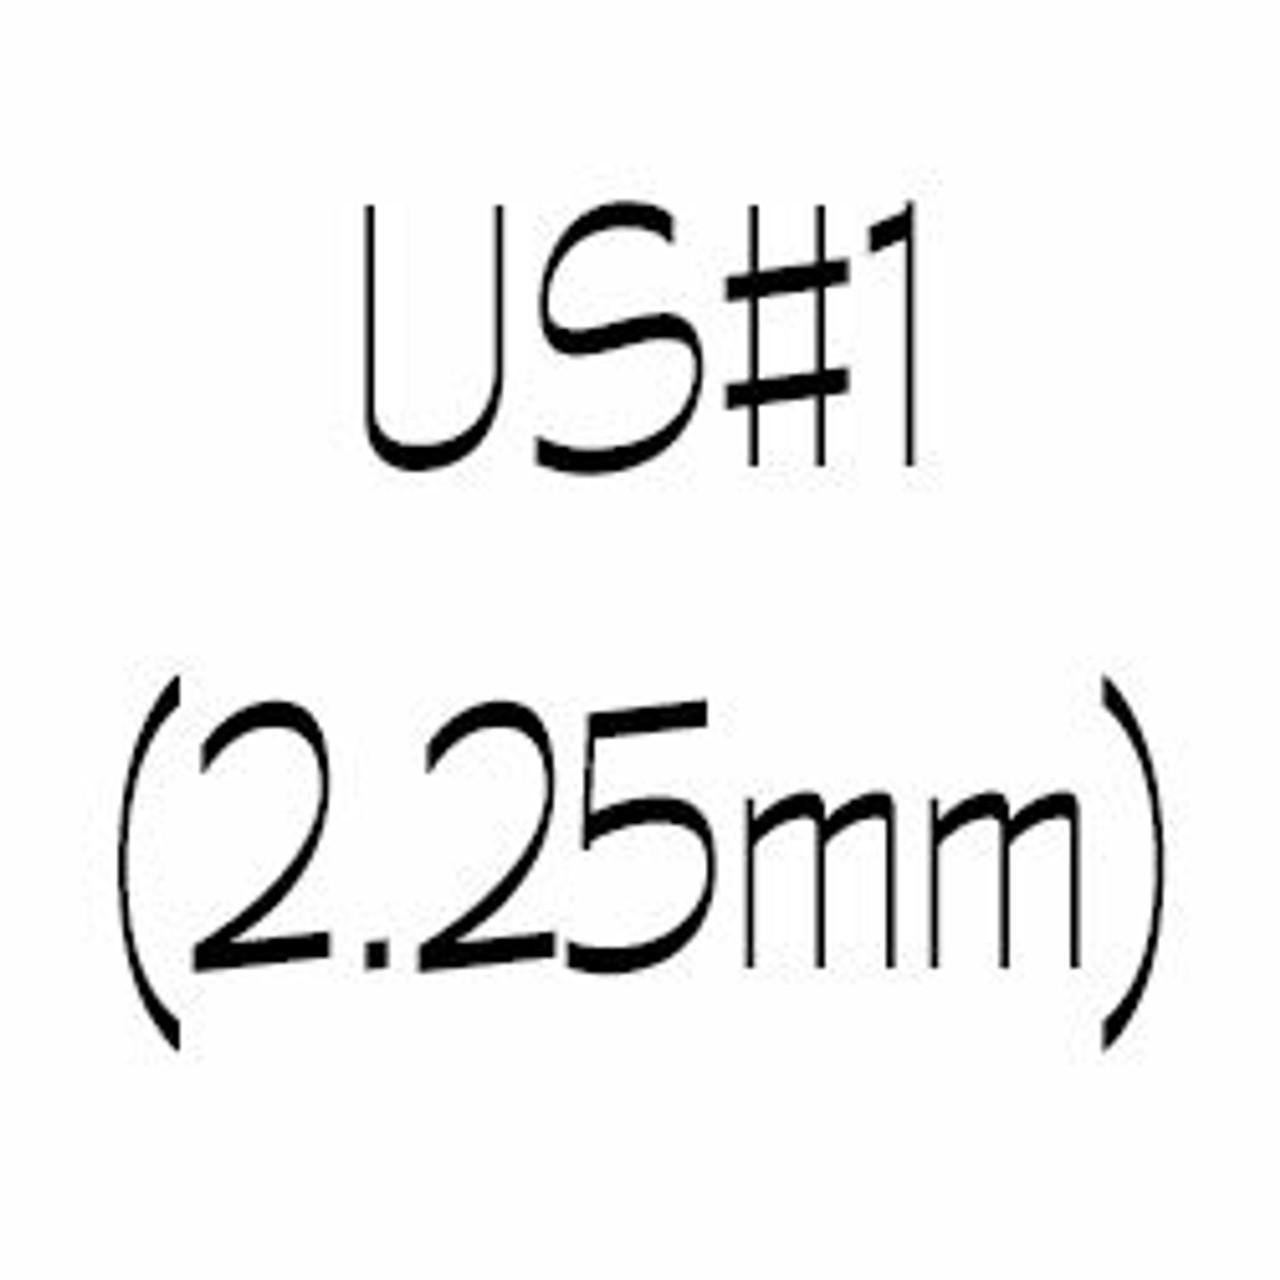 US#1 (2.25mm) Single Point Knitting Needles